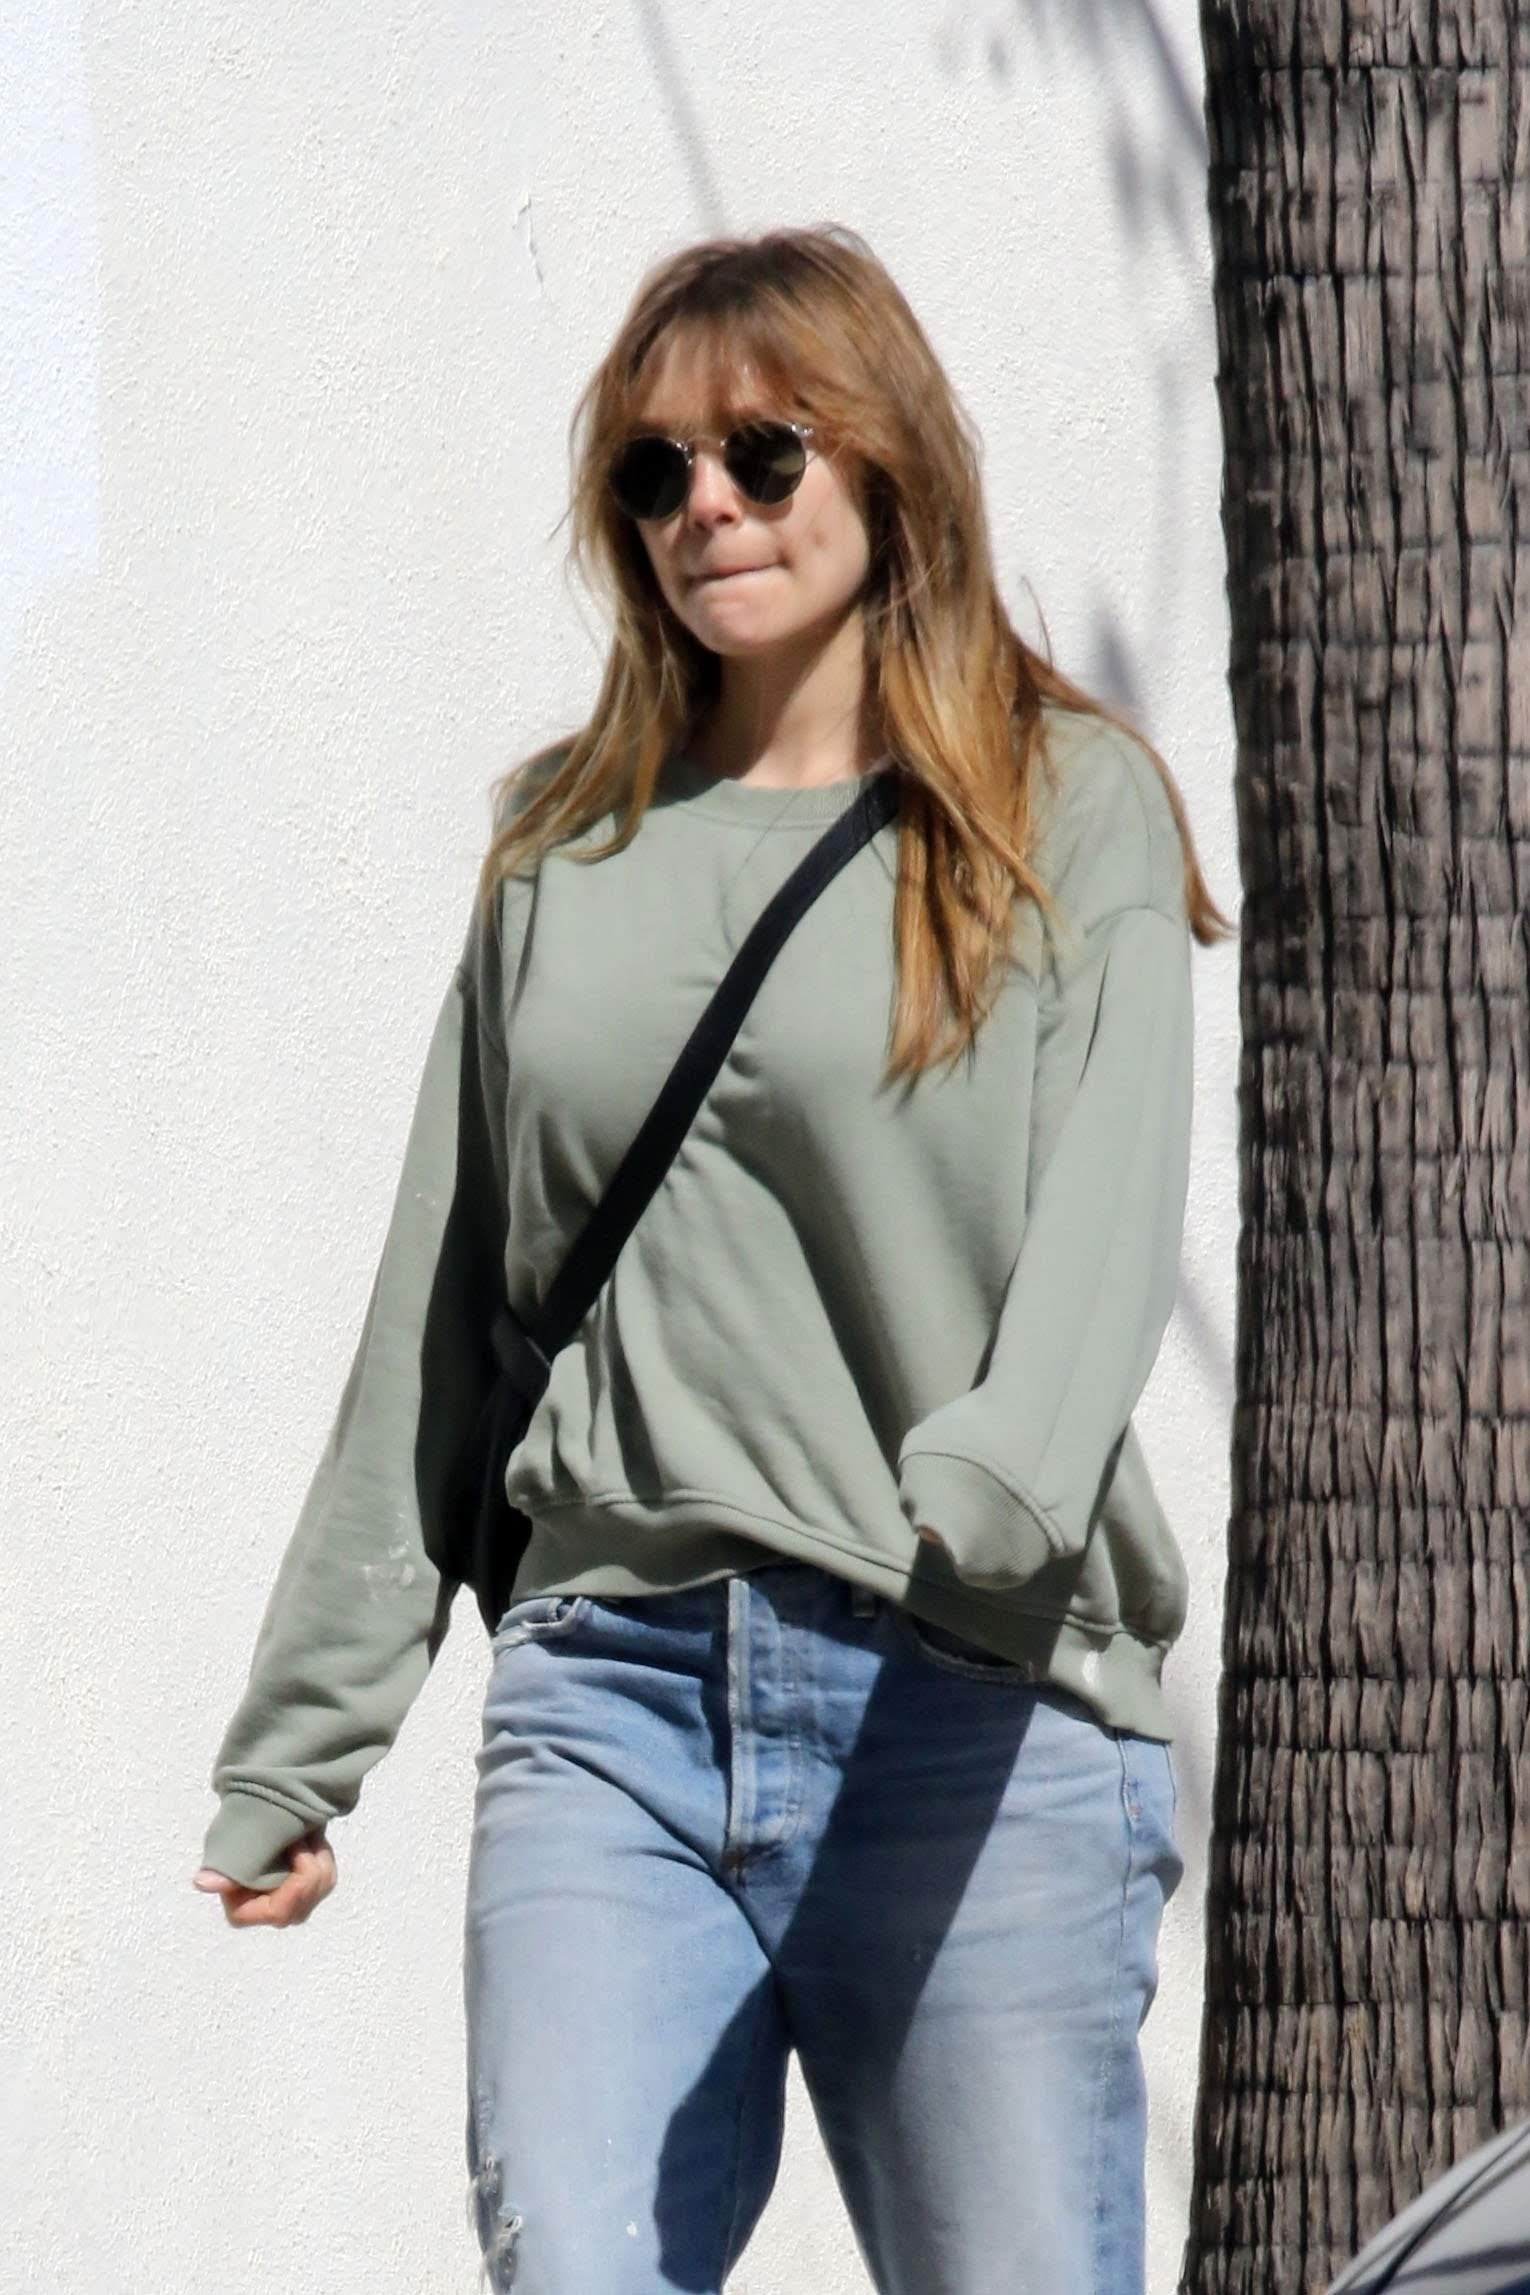 Elizabeth Olsen goes to Joans on Third in Studio City : ジョーンズ・オン・サードにお出かけのエリザベス・オルセン ! !